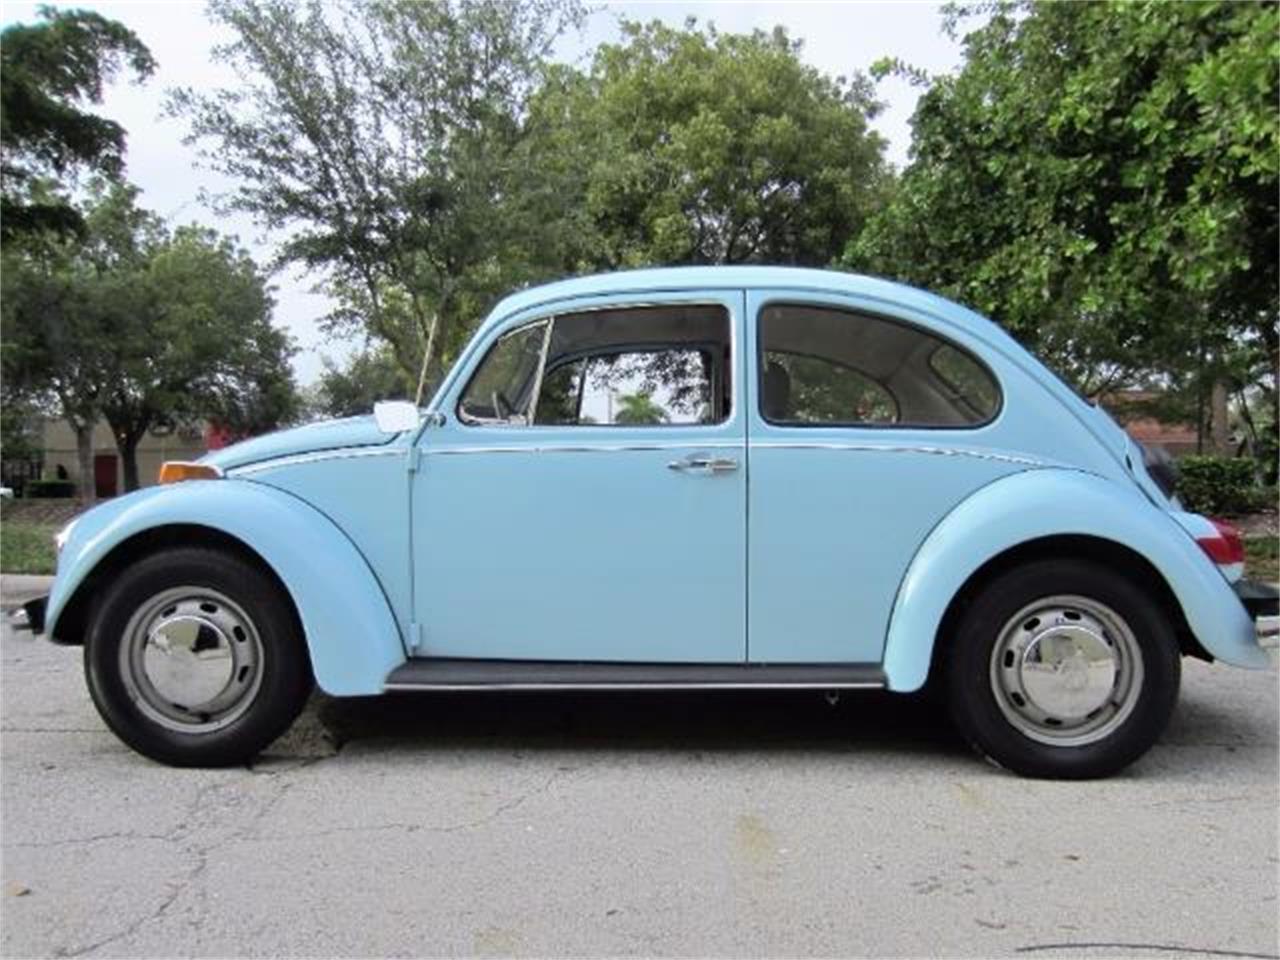 1970 Volkswagen Beetle For Sale Classiccars Com Cc 1027078